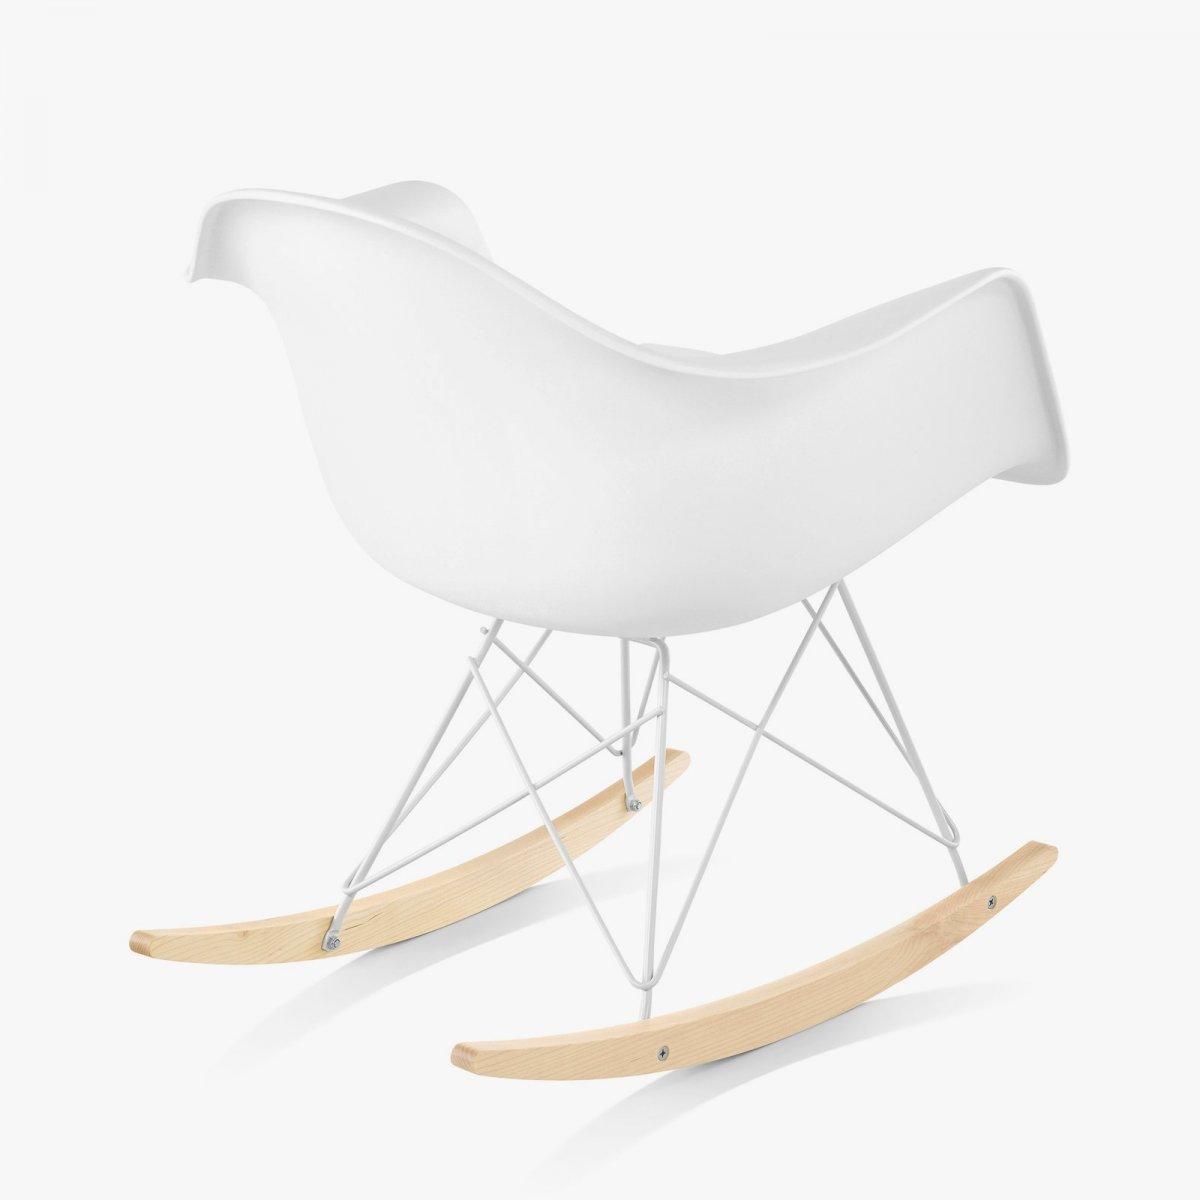 Eames Molded Plastic Armchair Rocker Base, white, back view.